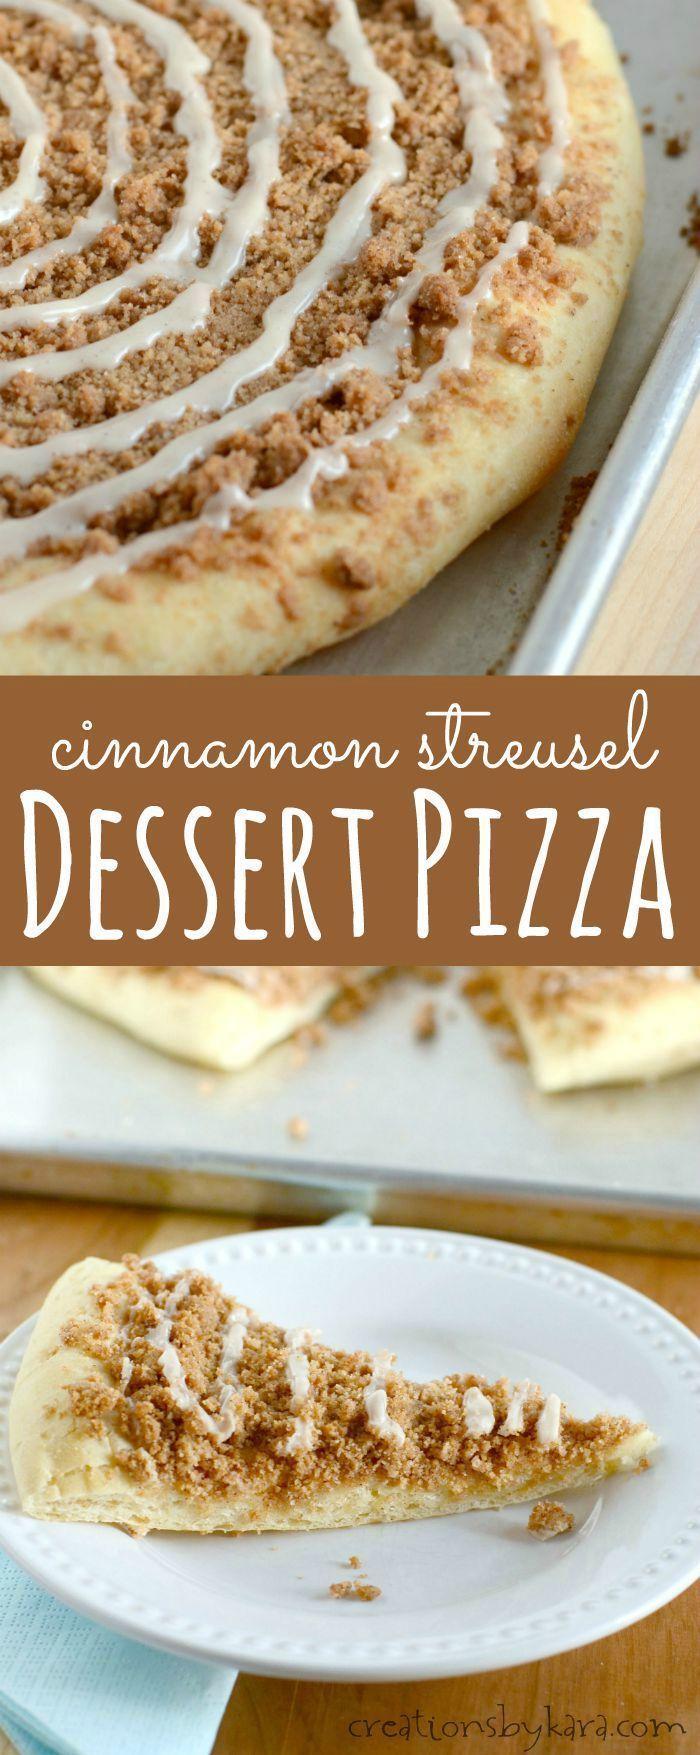 Recipe for homemade Cinnamon Crumb Dessert Pizza - this soft and chewy cinnamon ...              Recipe for homemade Cinnamon Crumb Dessert Pizza - this soft and chewy cinnamon dessert pizza is always a hit!